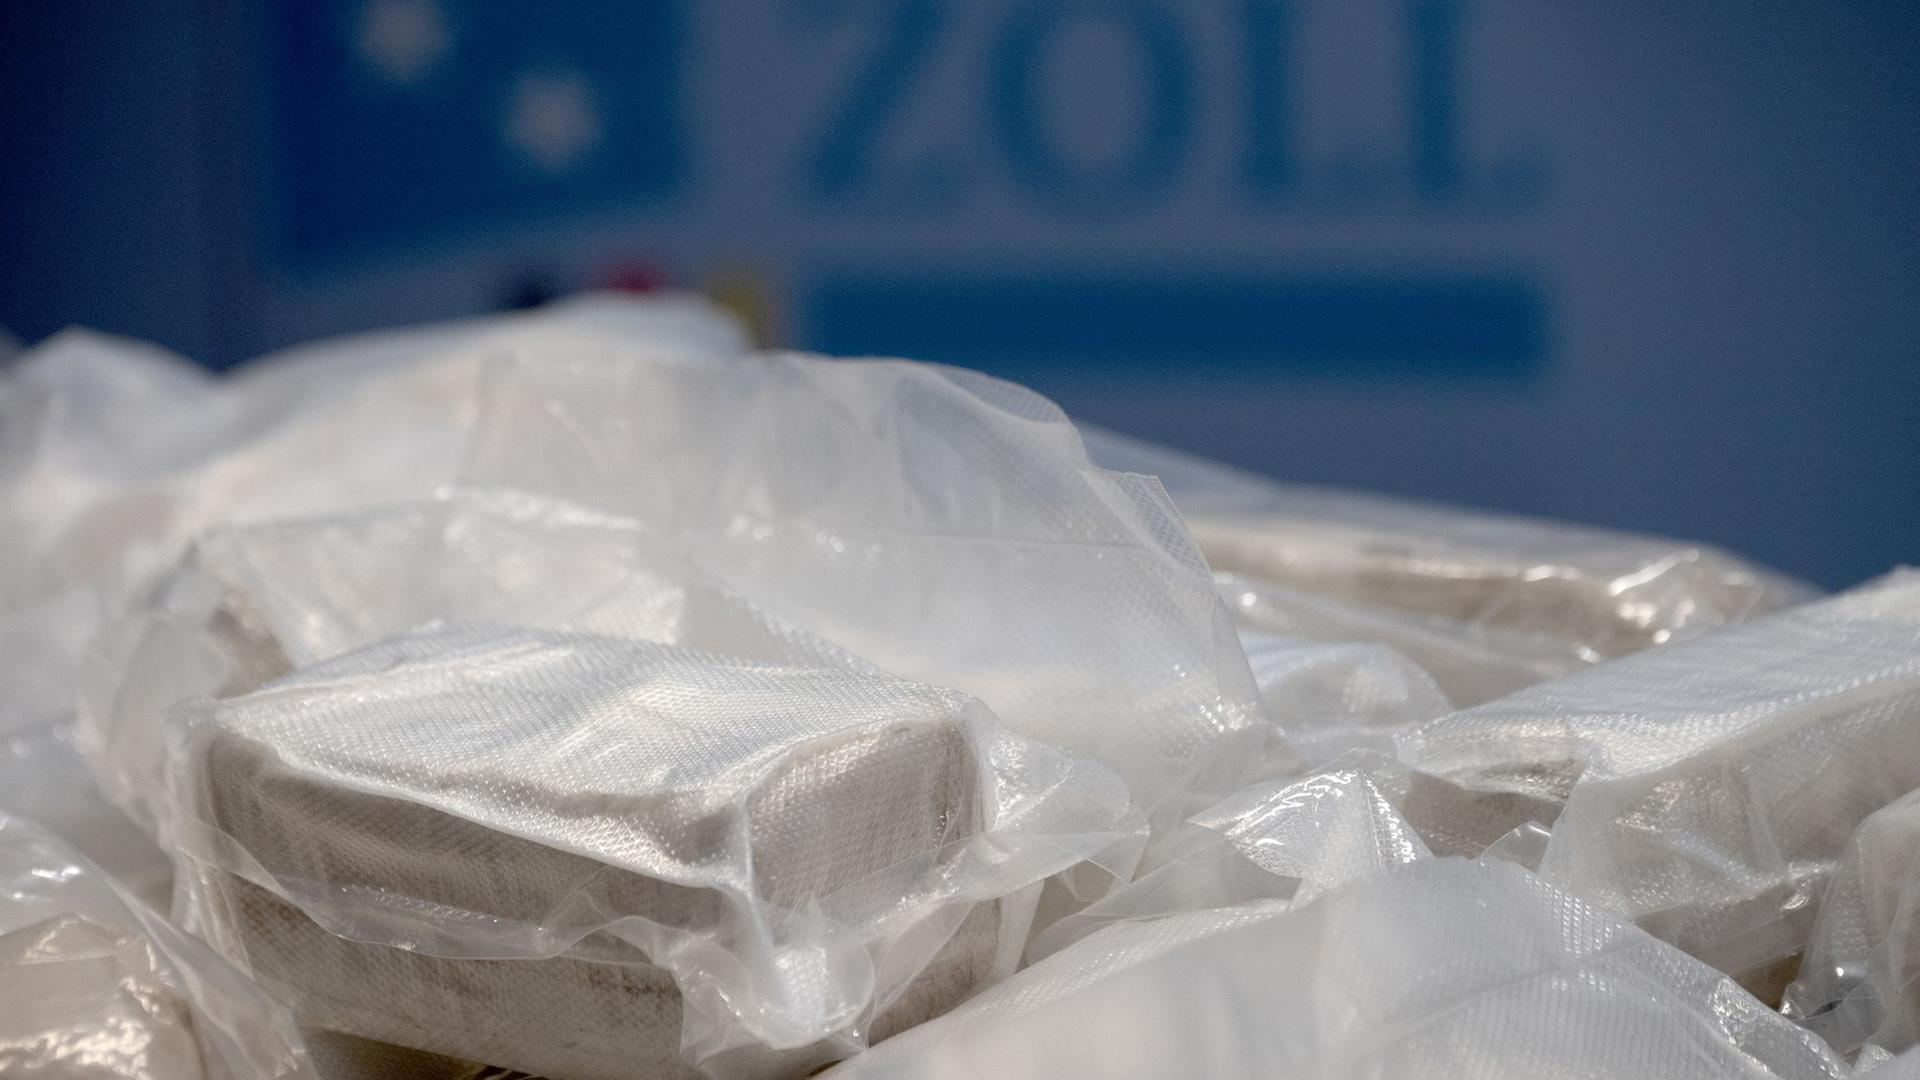 Die Bedrohung durch illegale Drogen hält an.